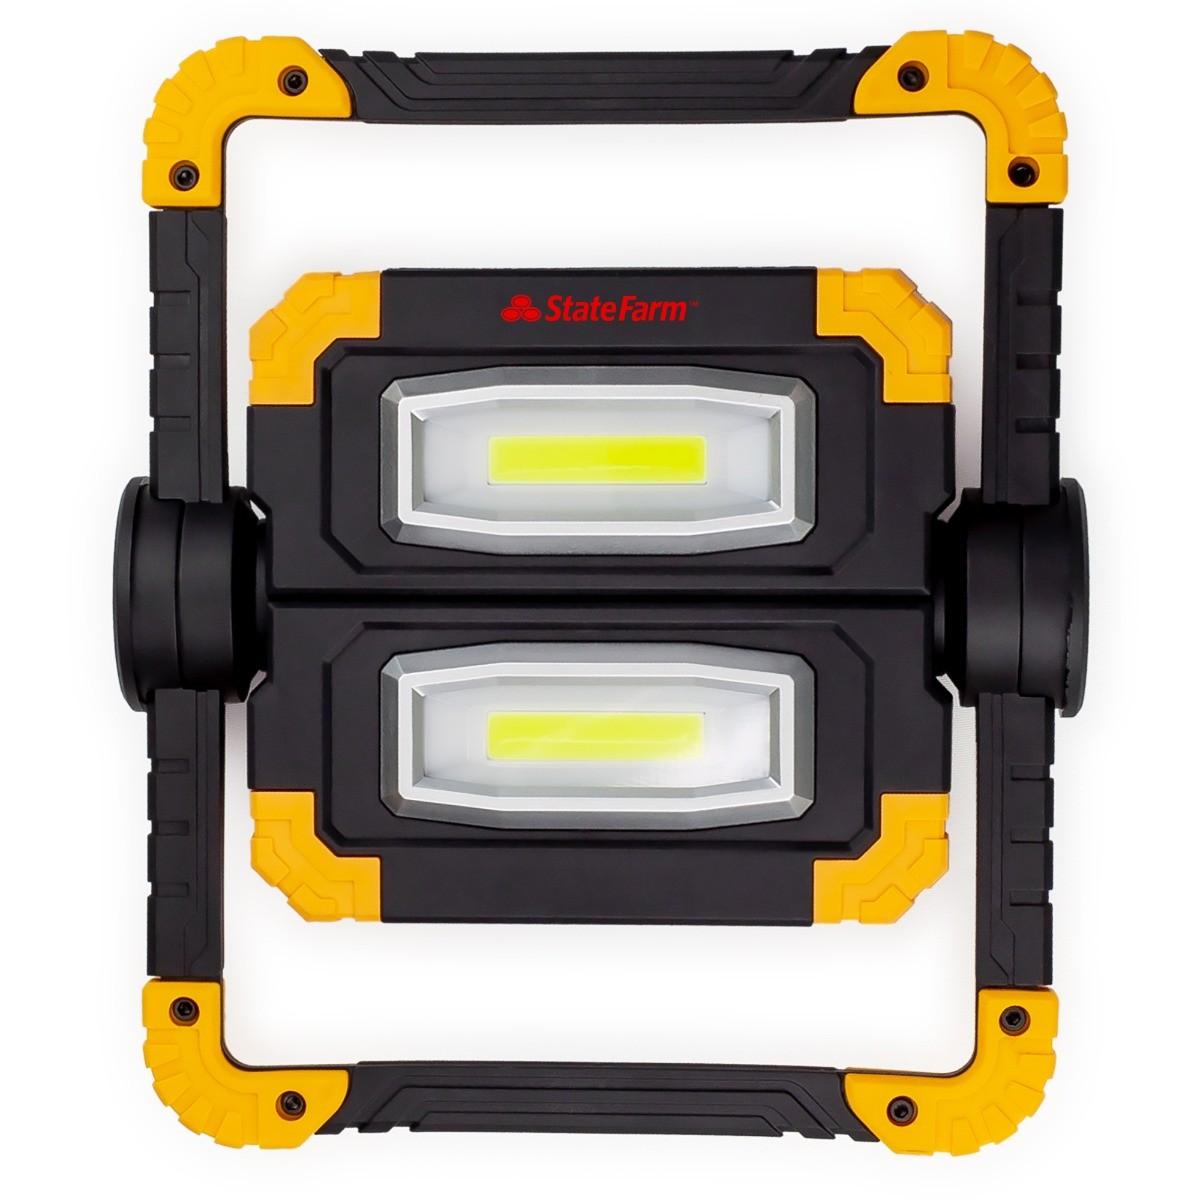 MEGA 10 W 550 Lumen Work Light